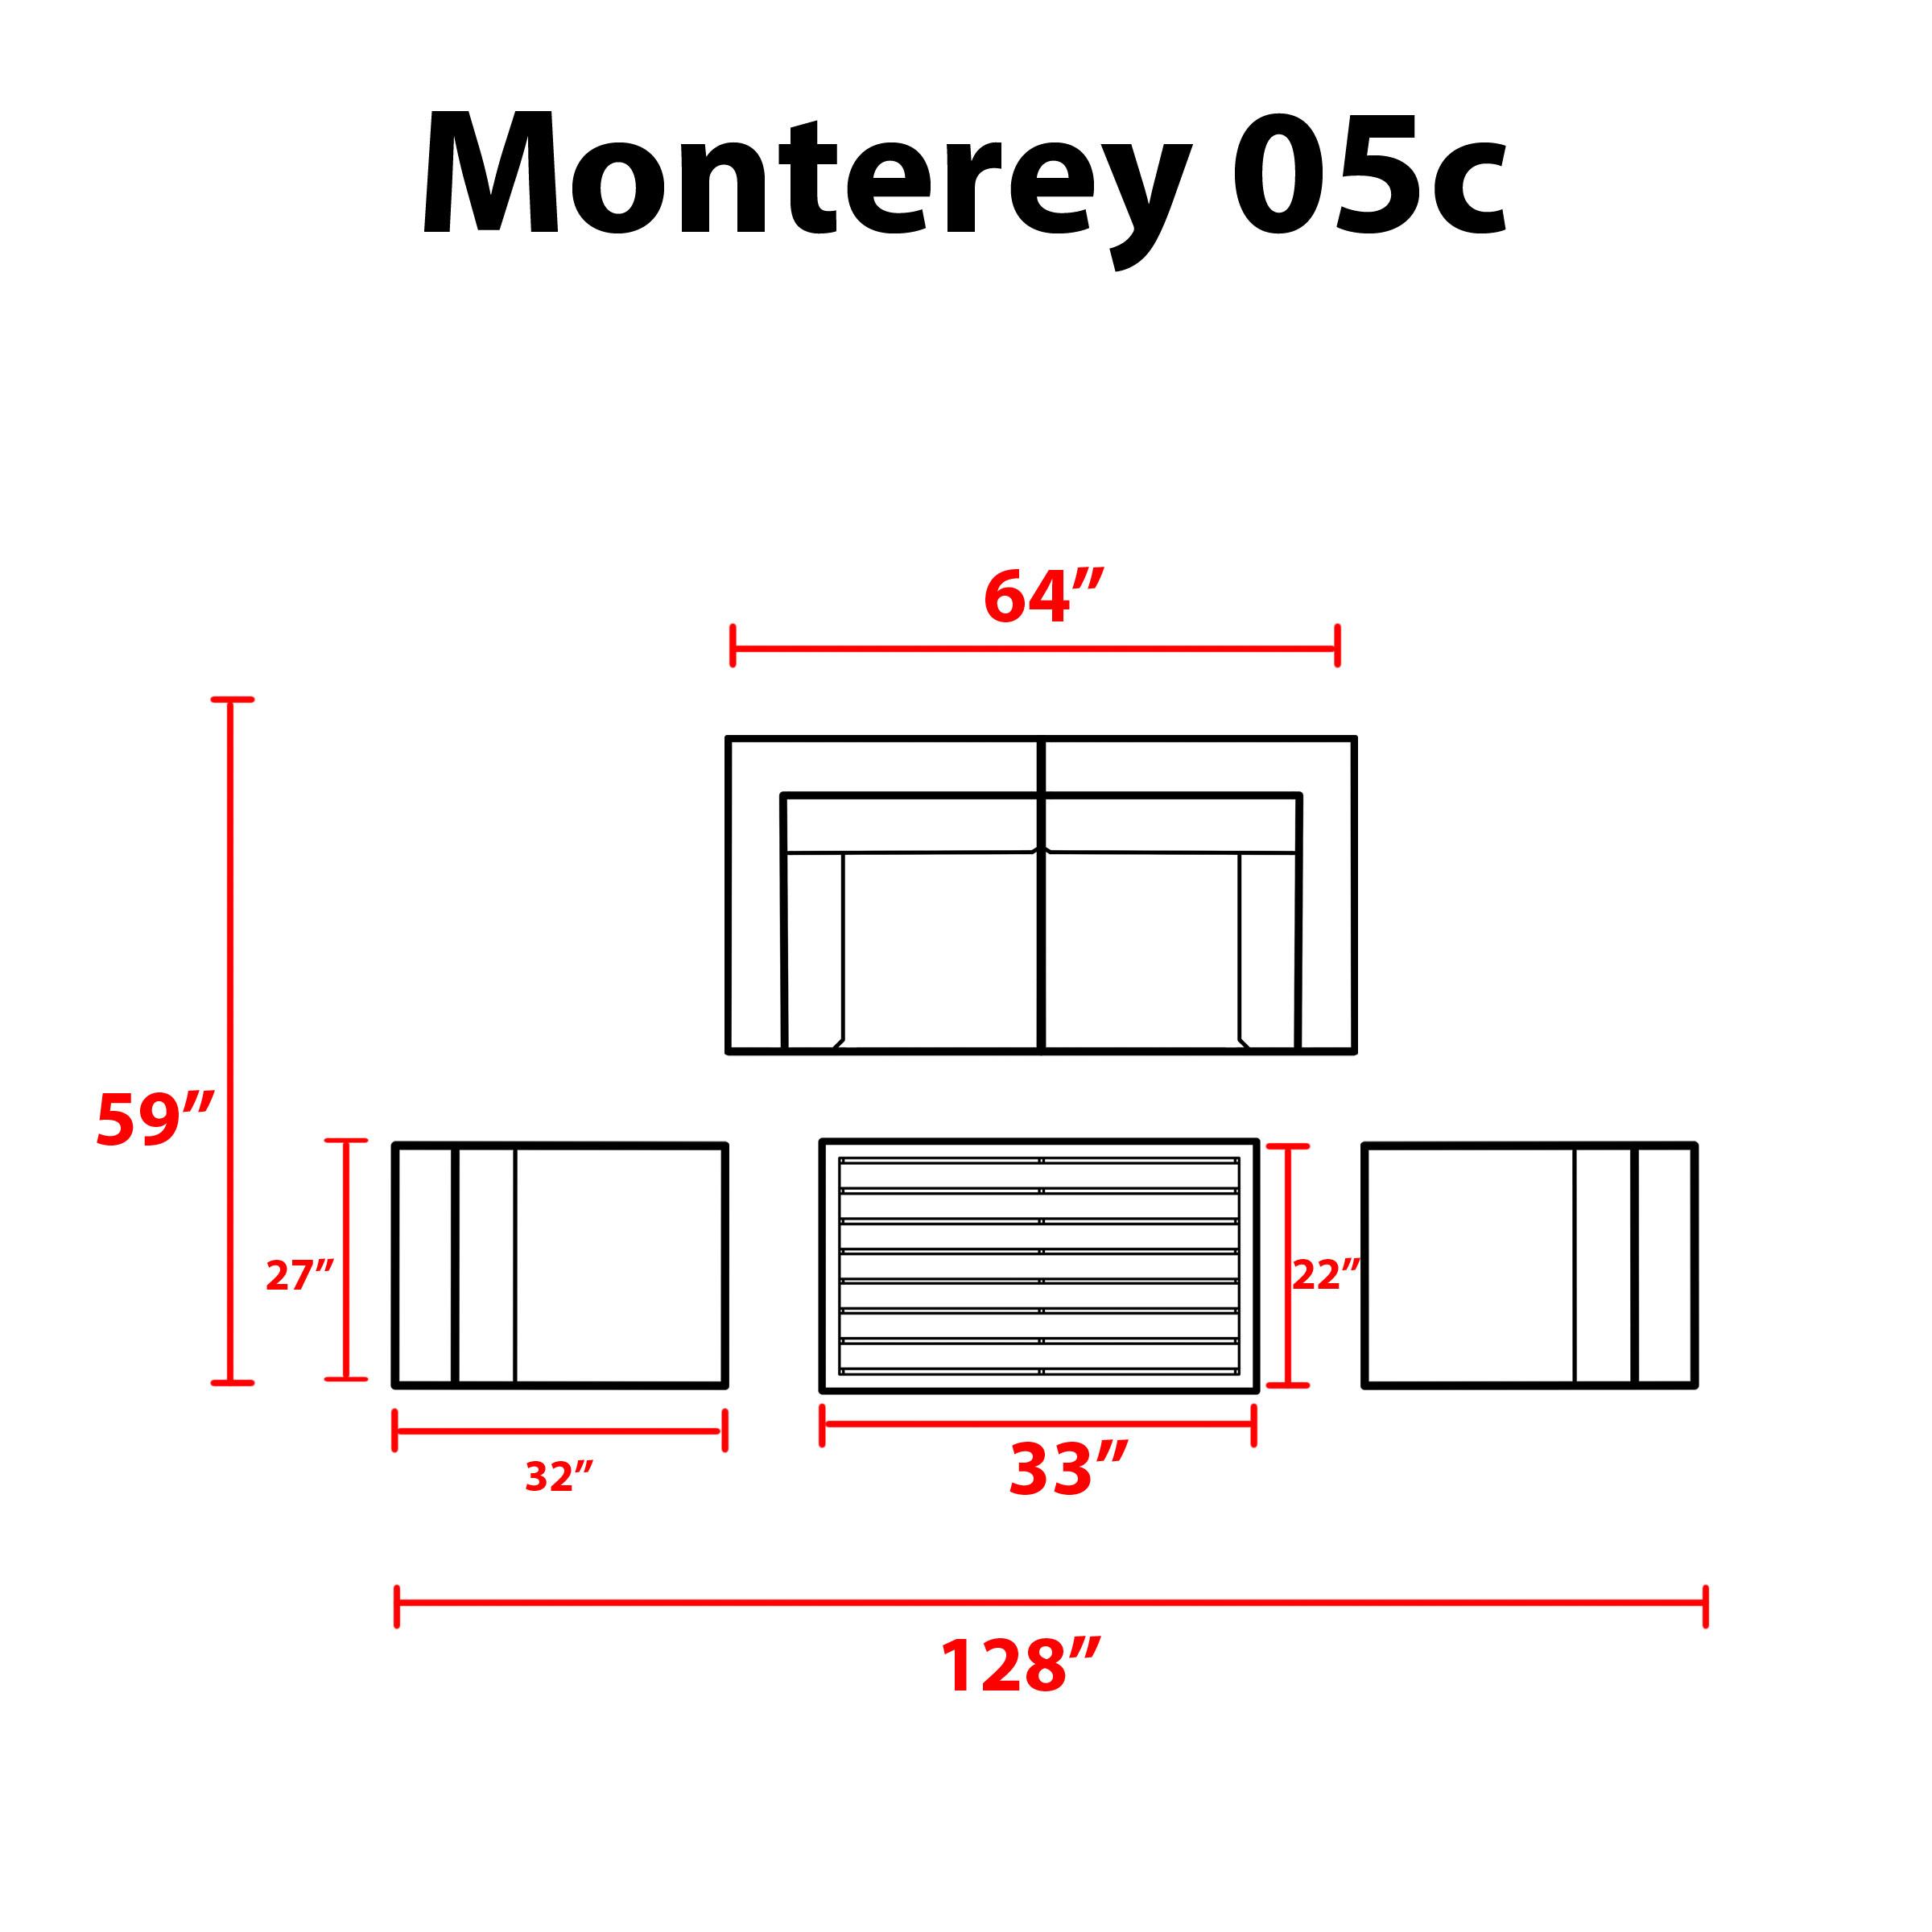 Monterey 5 Piece Outdoor Wicker Patio Furniture Set 05c -